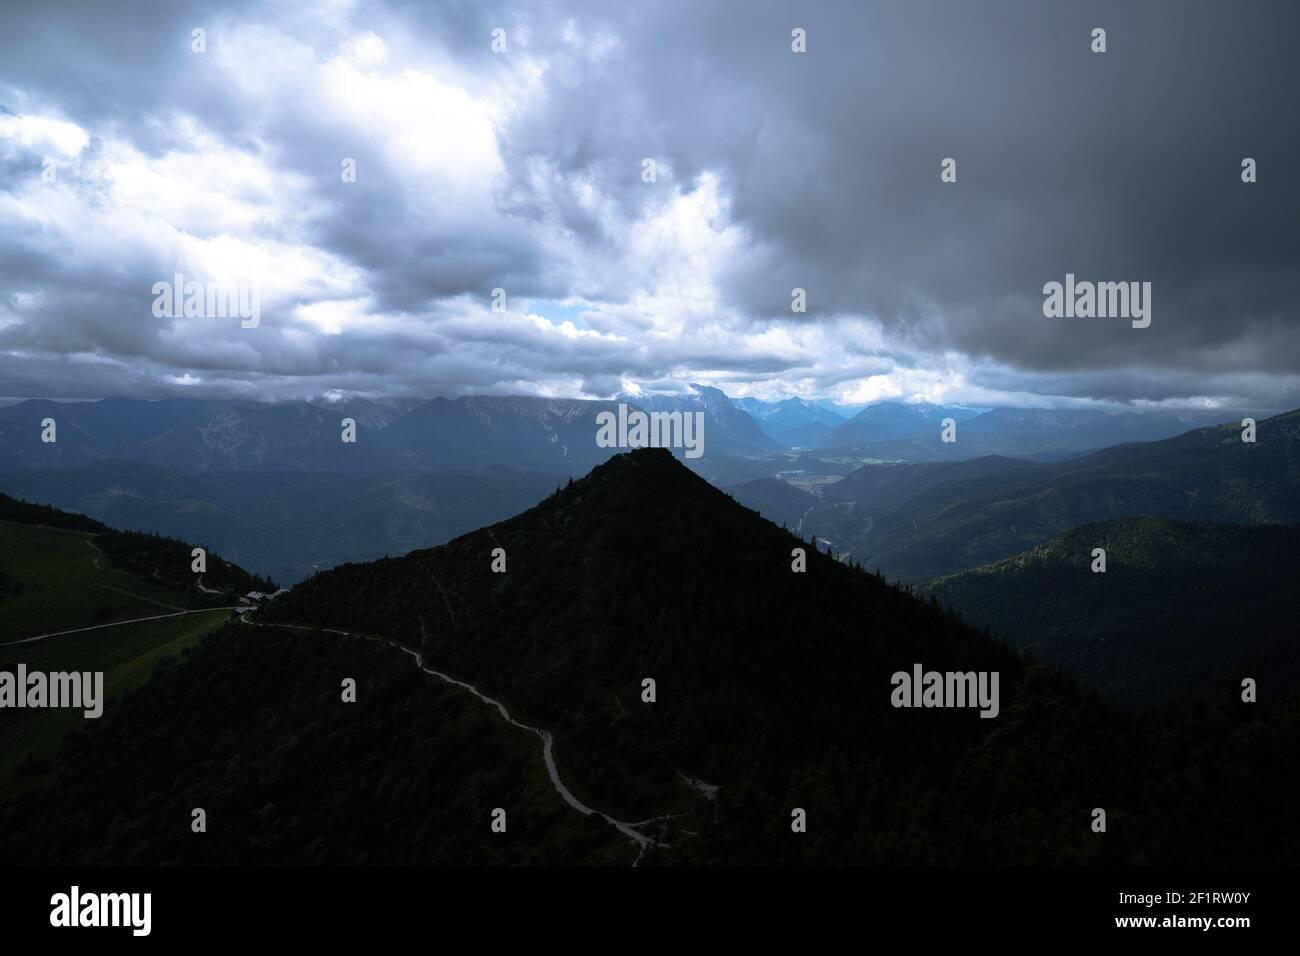 vista al monte herzogstand en baviera Foto de stock